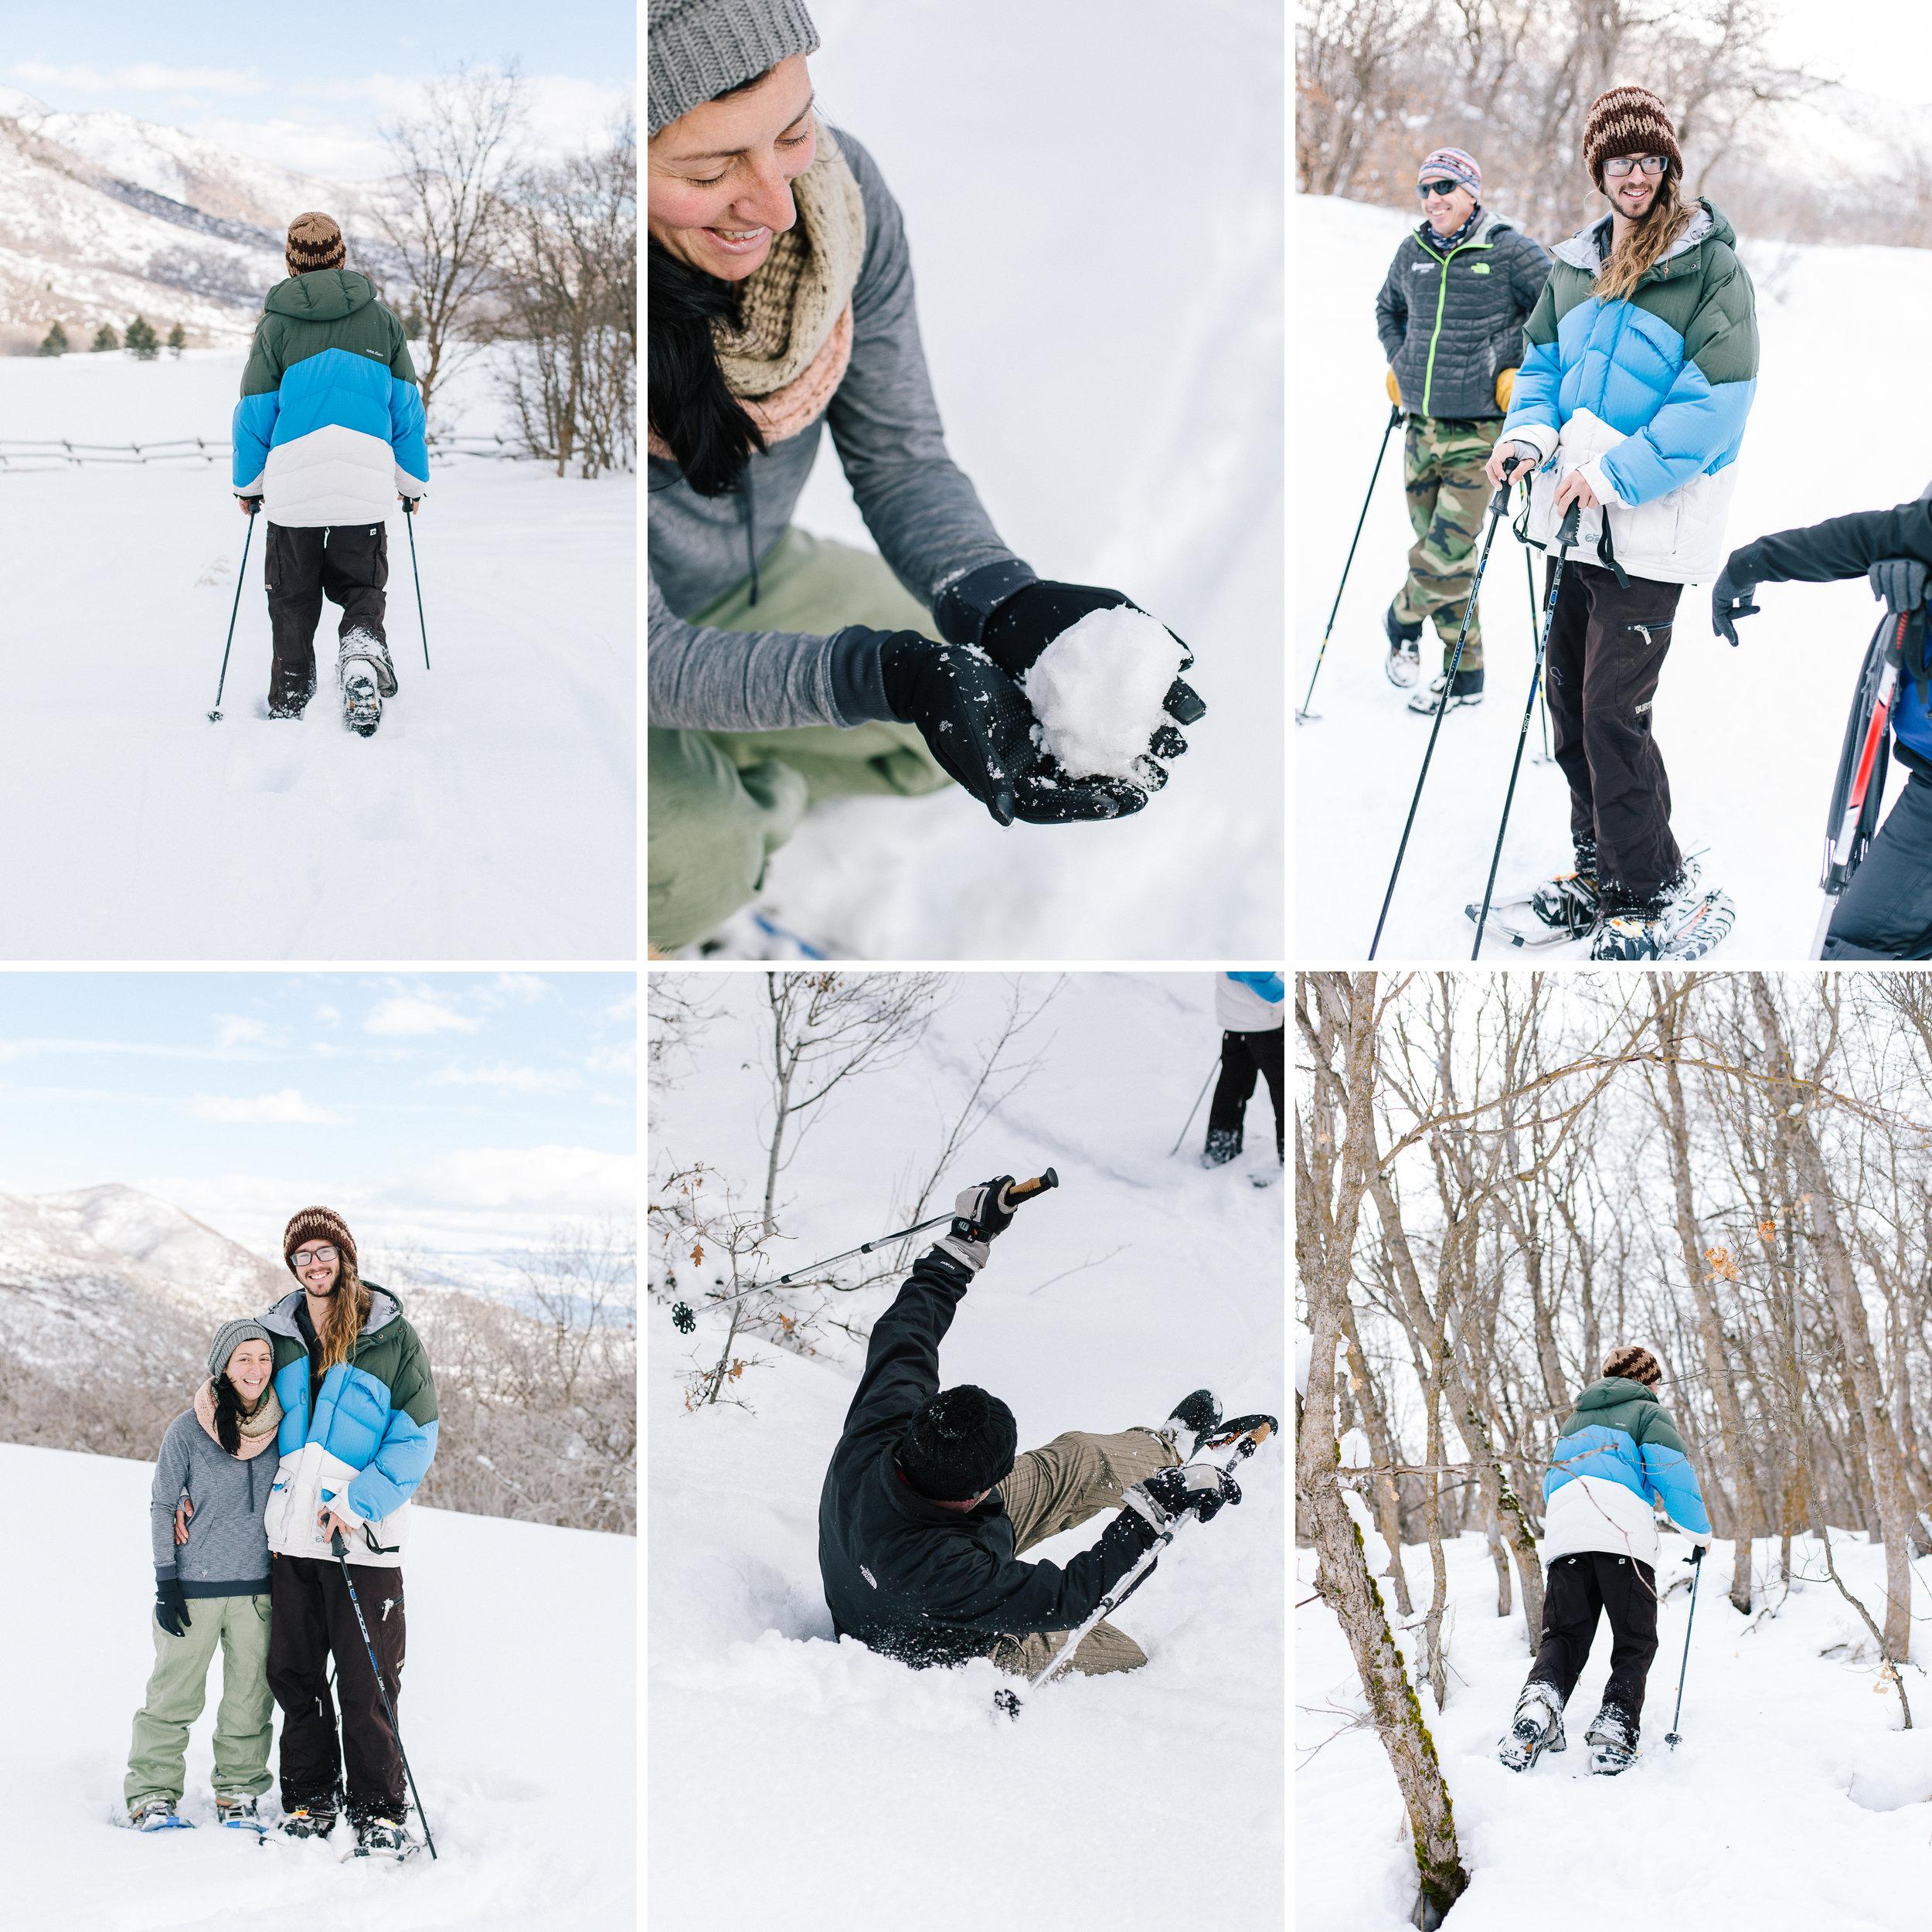 daidrismythephotography_snowshoeing_31.jpg